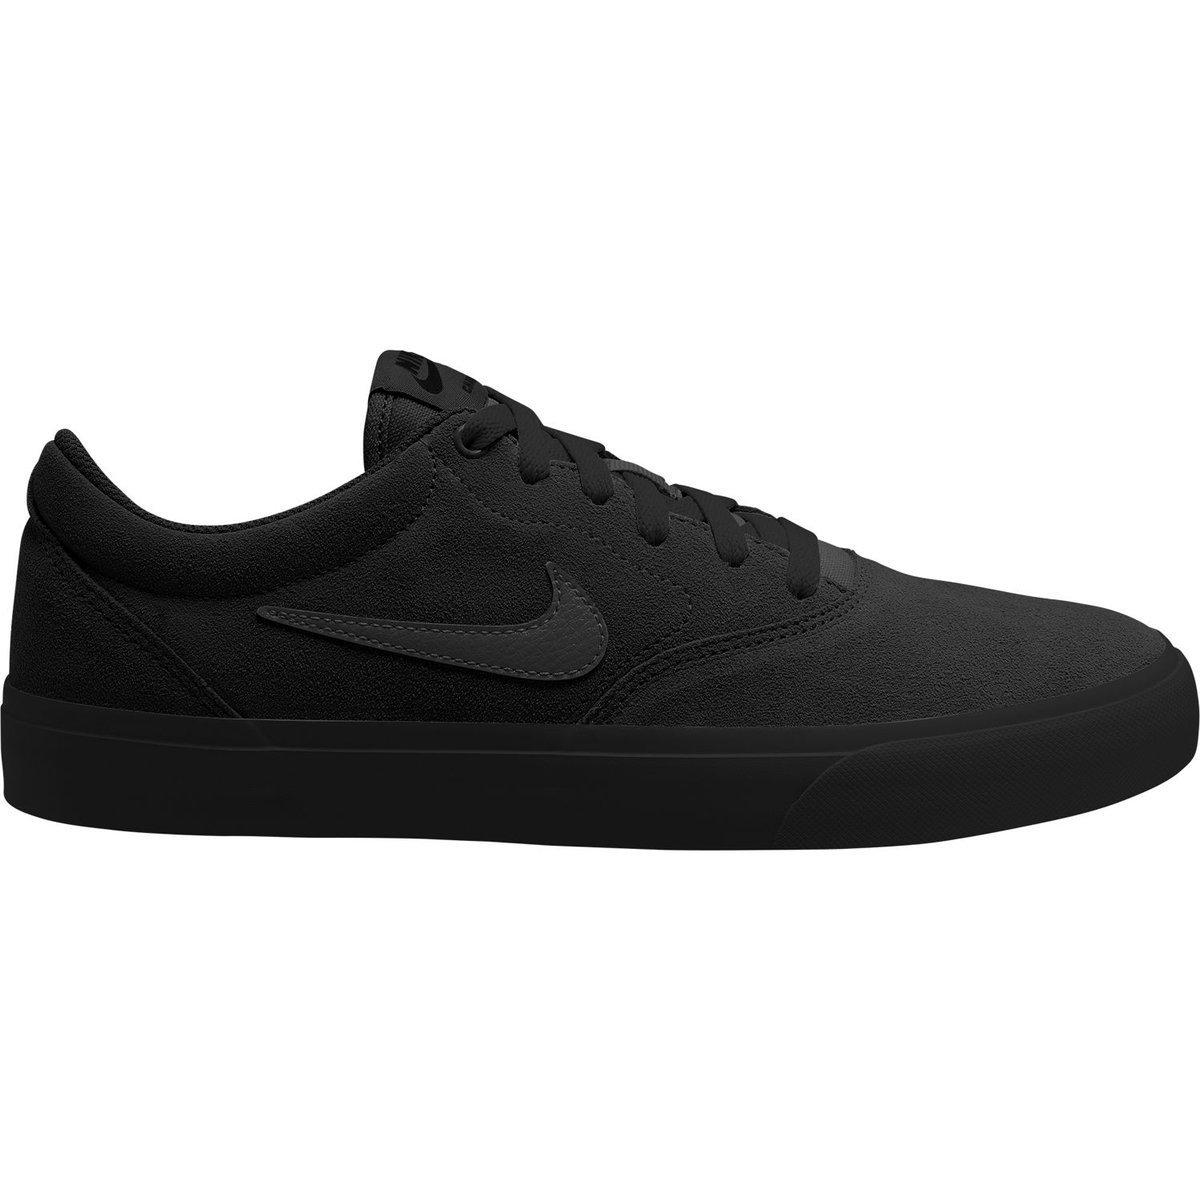 Nike SB Charge Suede Black/black-black